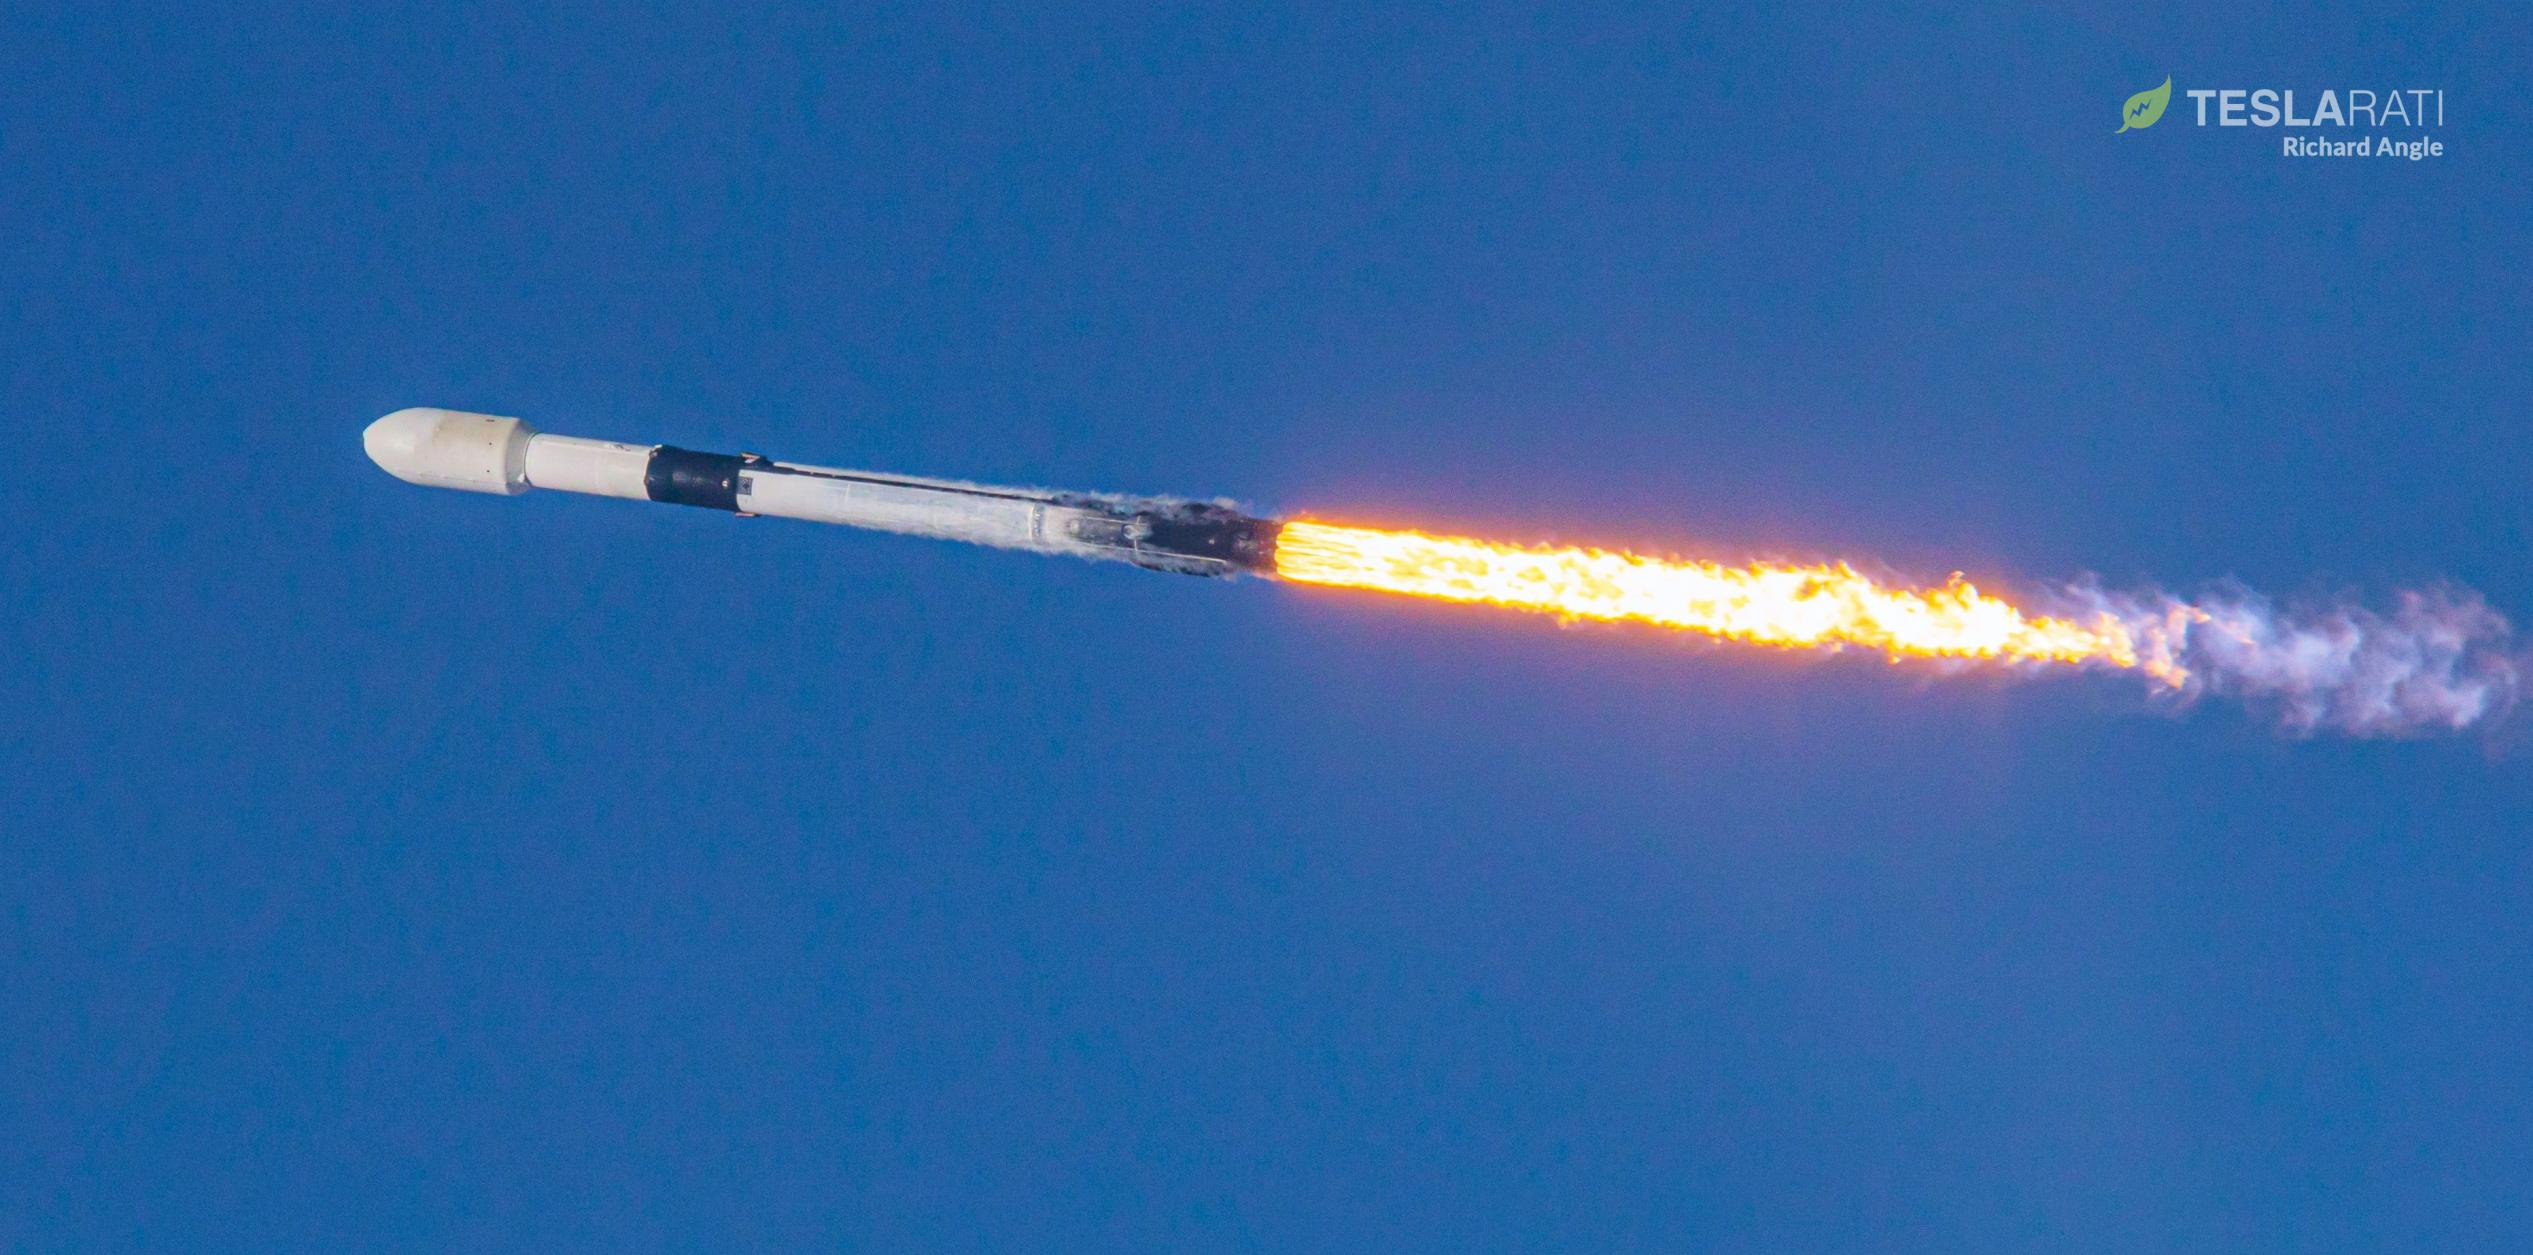 SXM-7 Falcon 9 B1051 LC-40 121320 (Richard Angle) launch 2 crop (c)